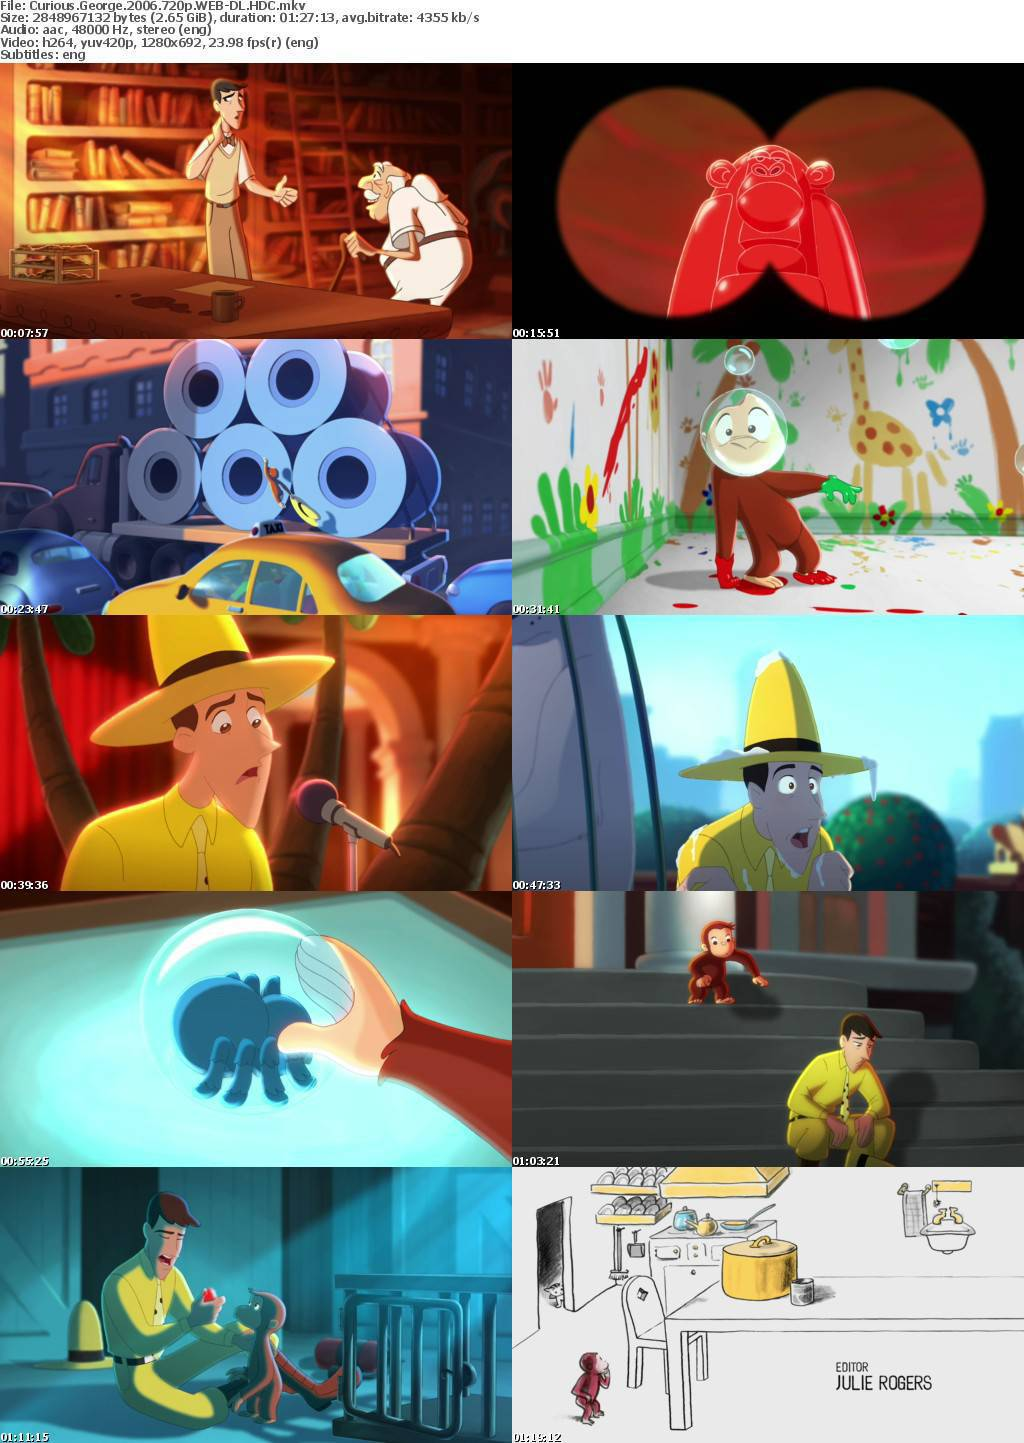 Curious George (2006) Screenshots